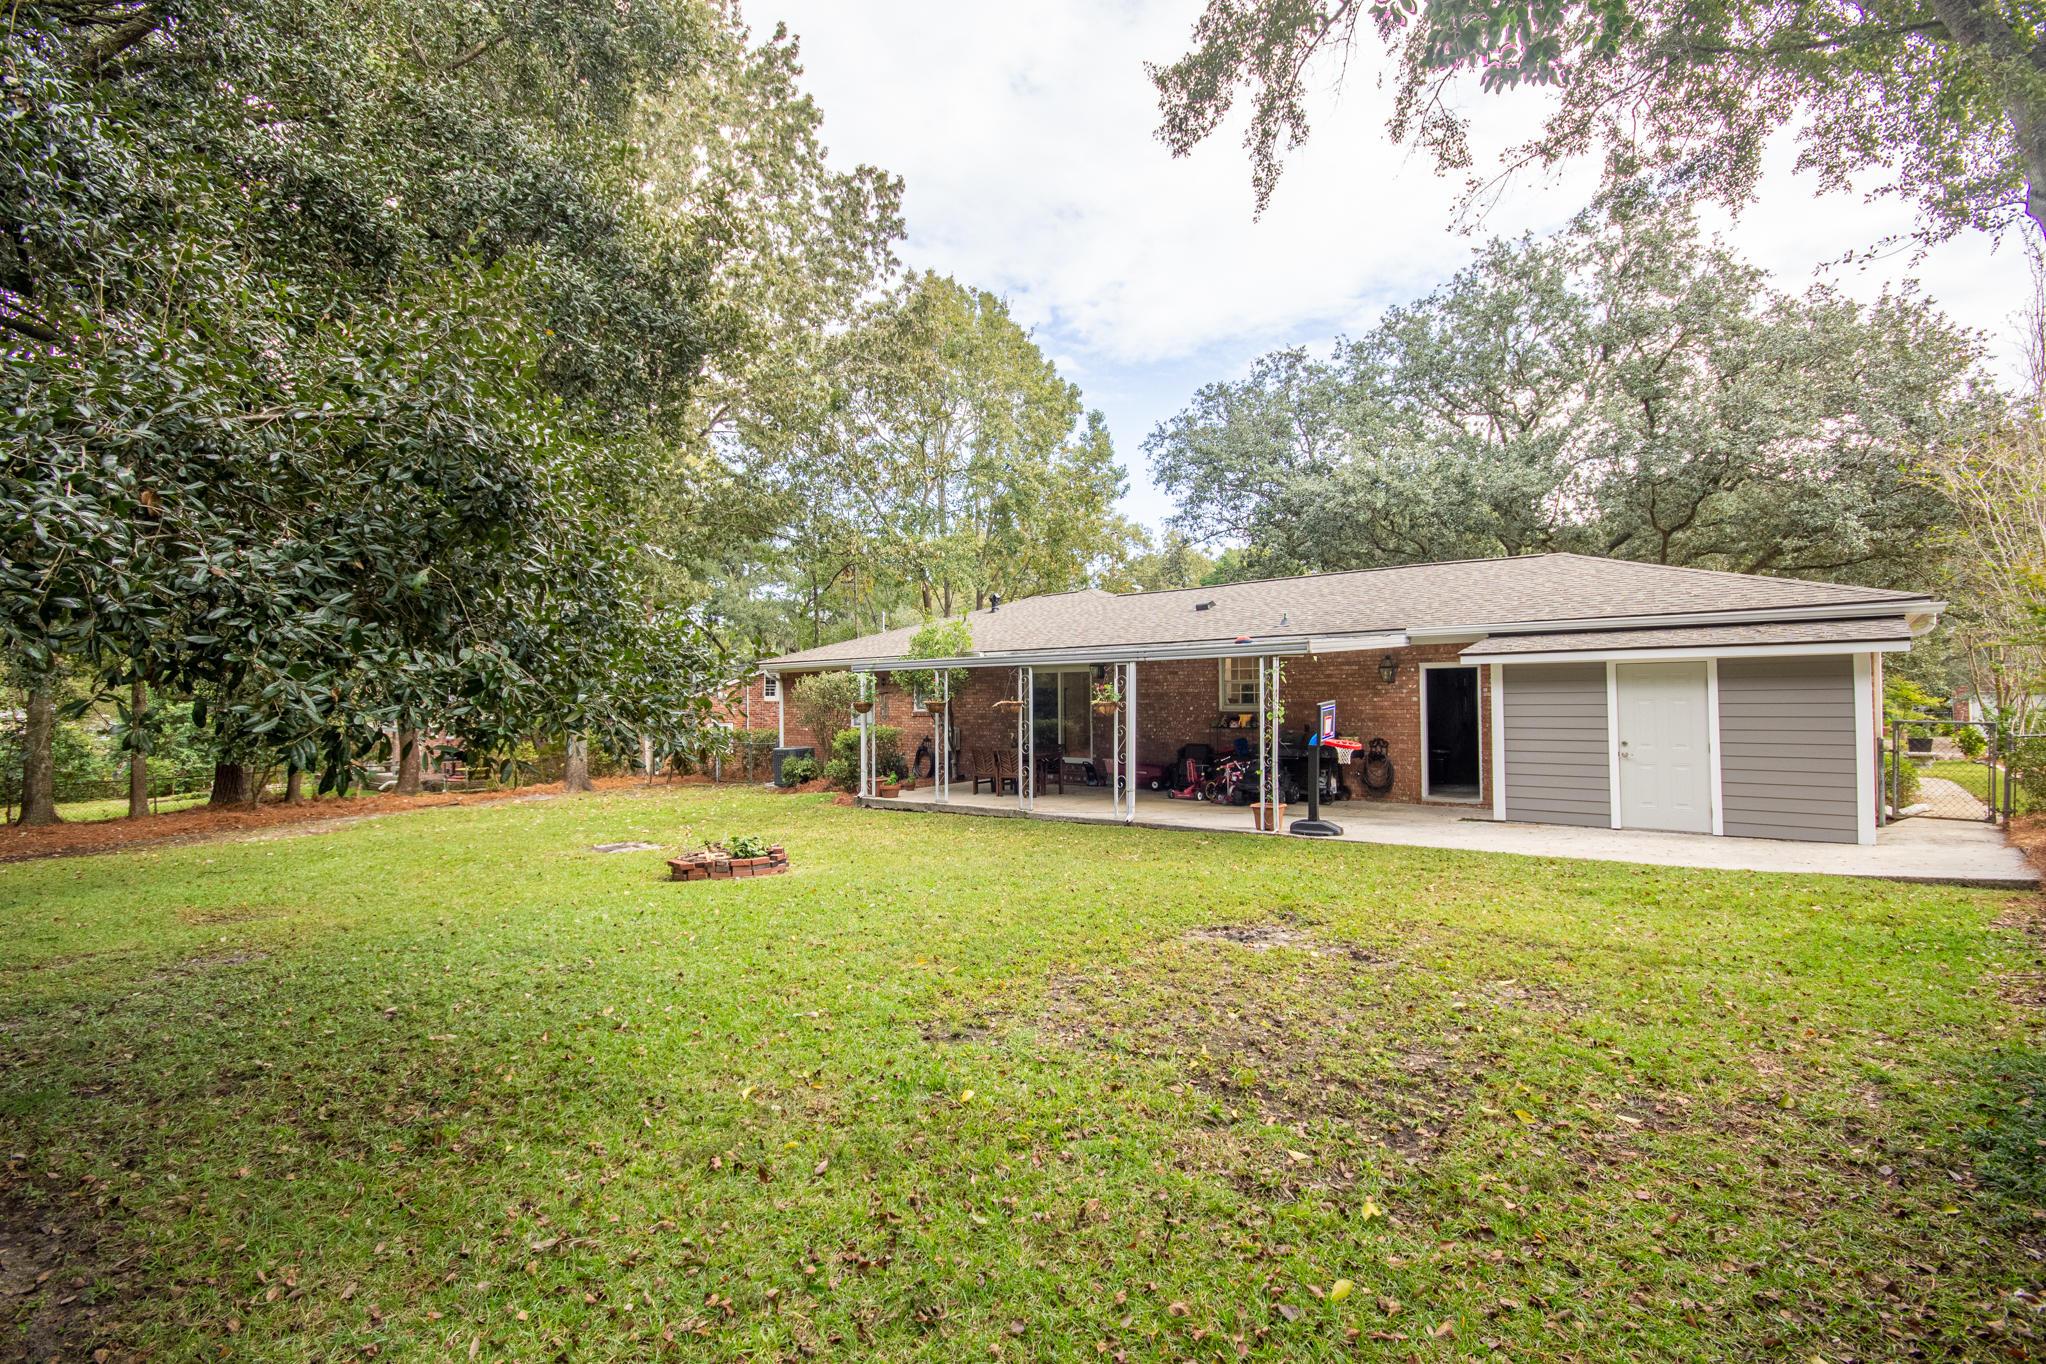 Belvedere Estates Homes For Sale - 6021 Rembert, Hanahan, SC - 25